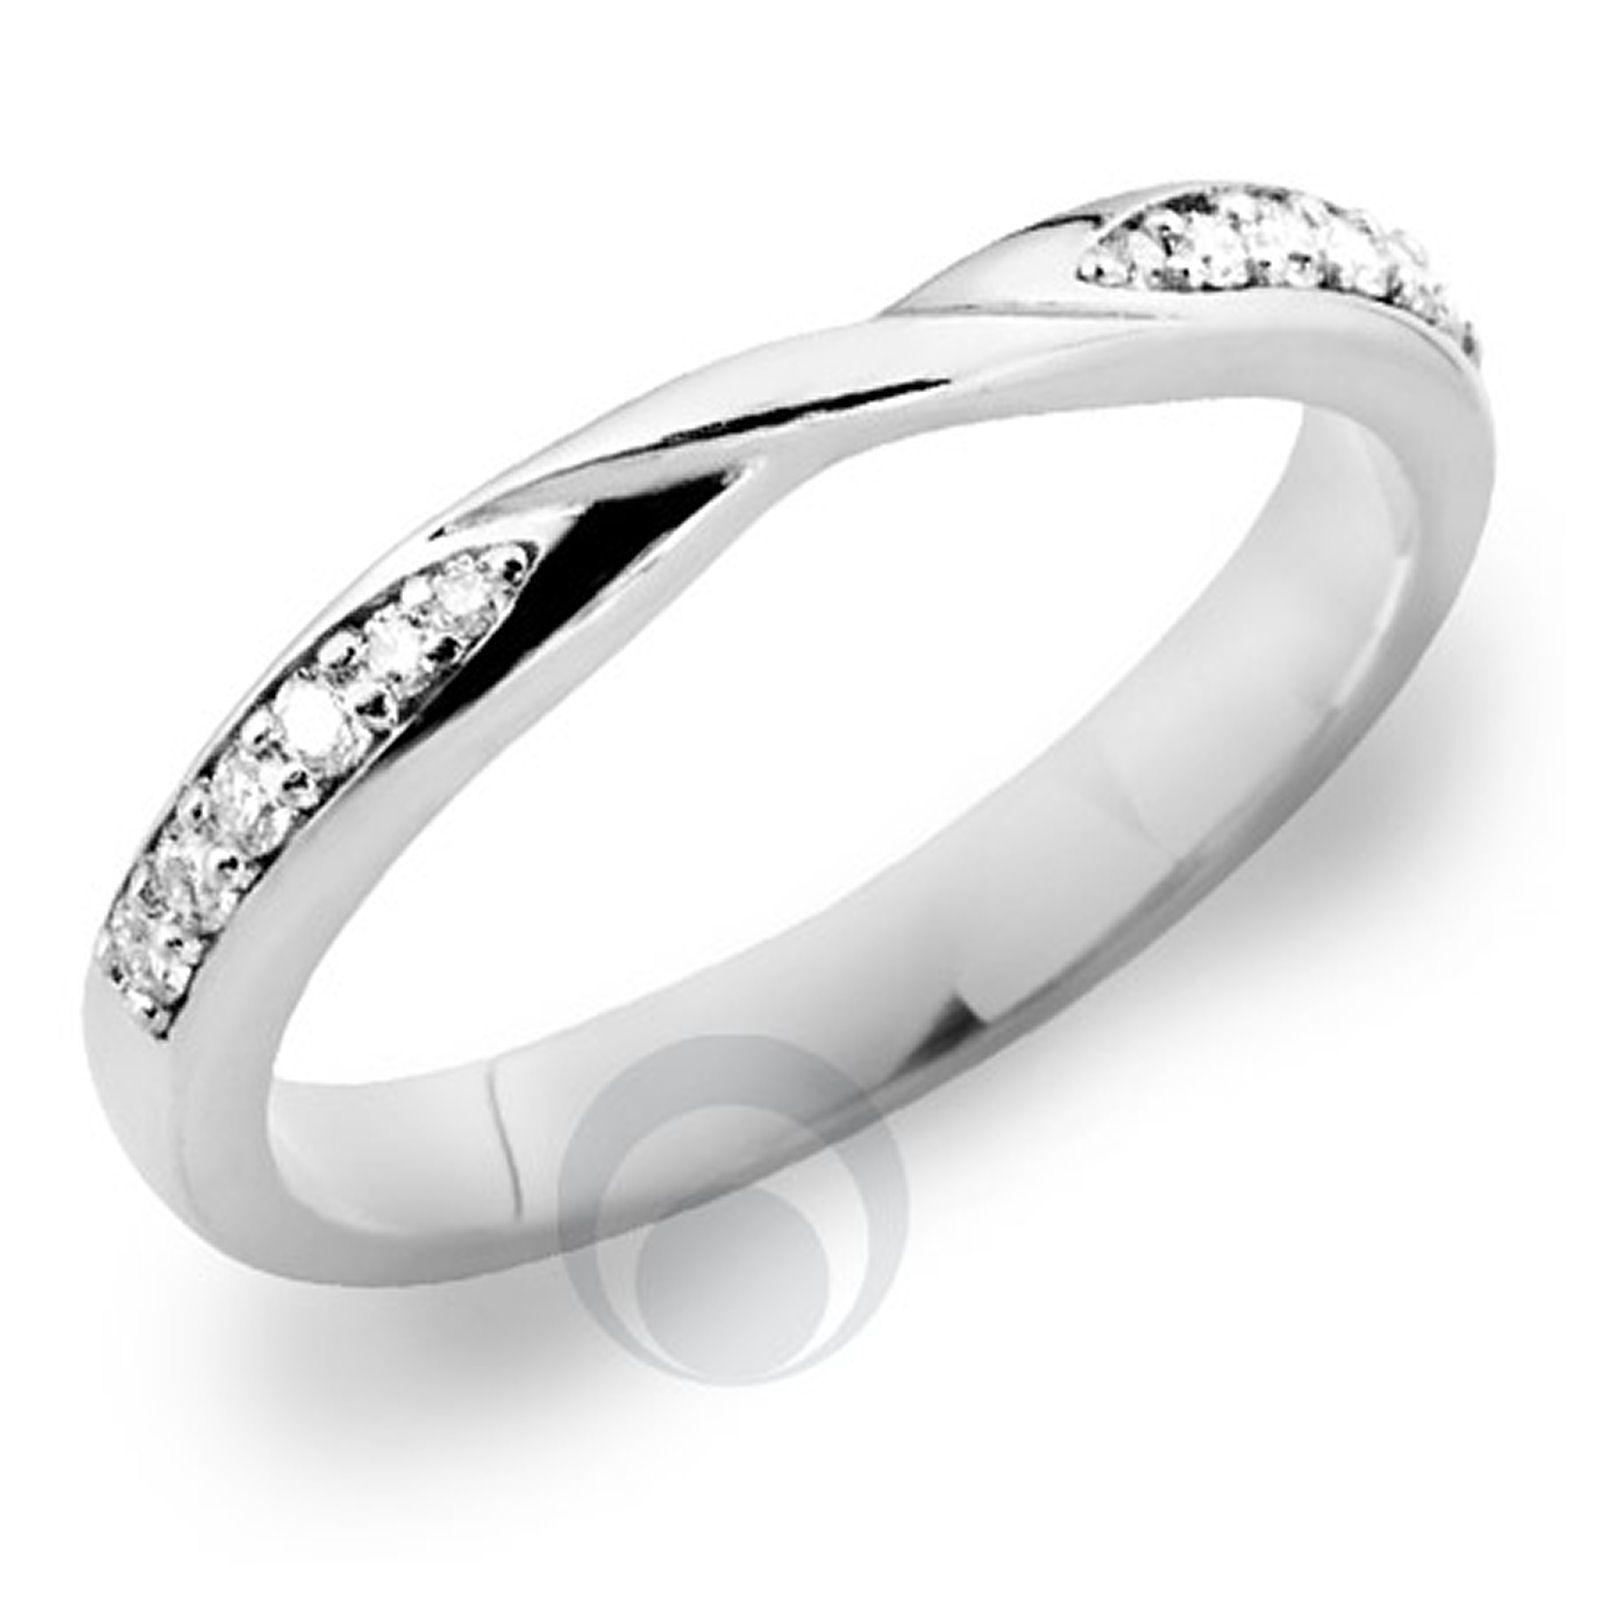 wedding rings pictures fine platinum wedding rings - Platinum Wedding Rings